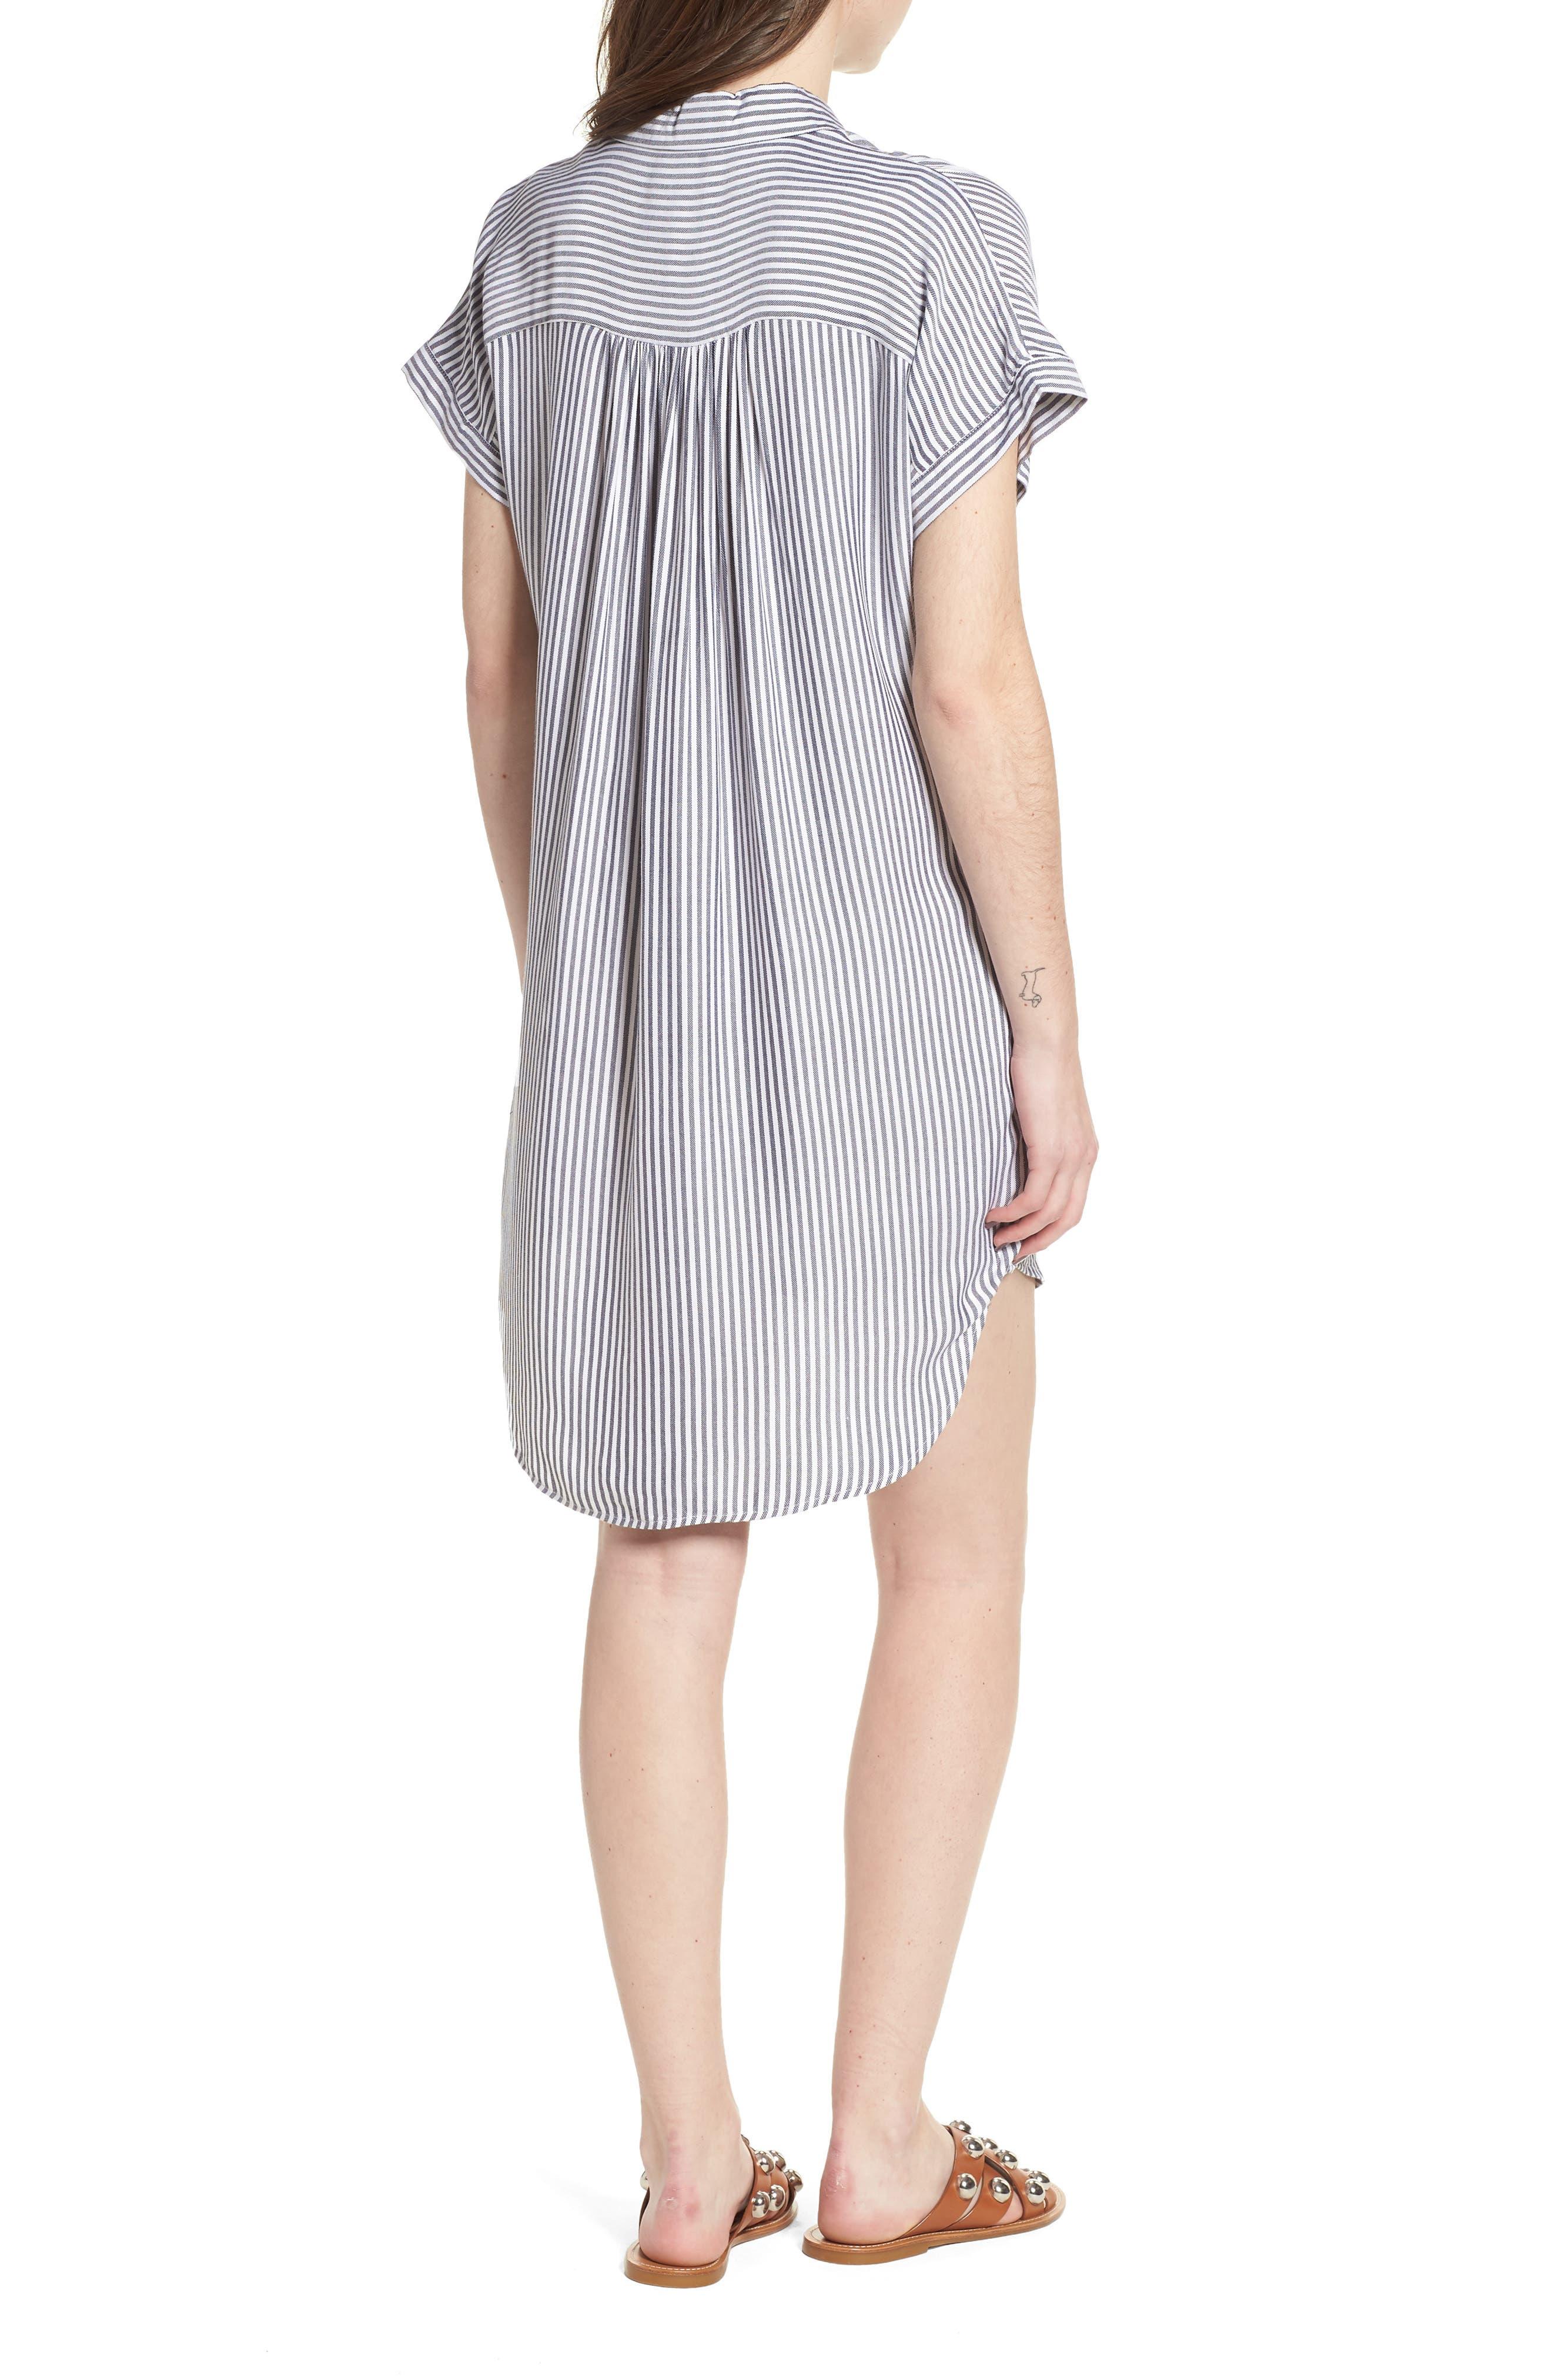 Skipper Stripe Shirtdress,                             Alternate thumbnail 2, color,                             Navy White